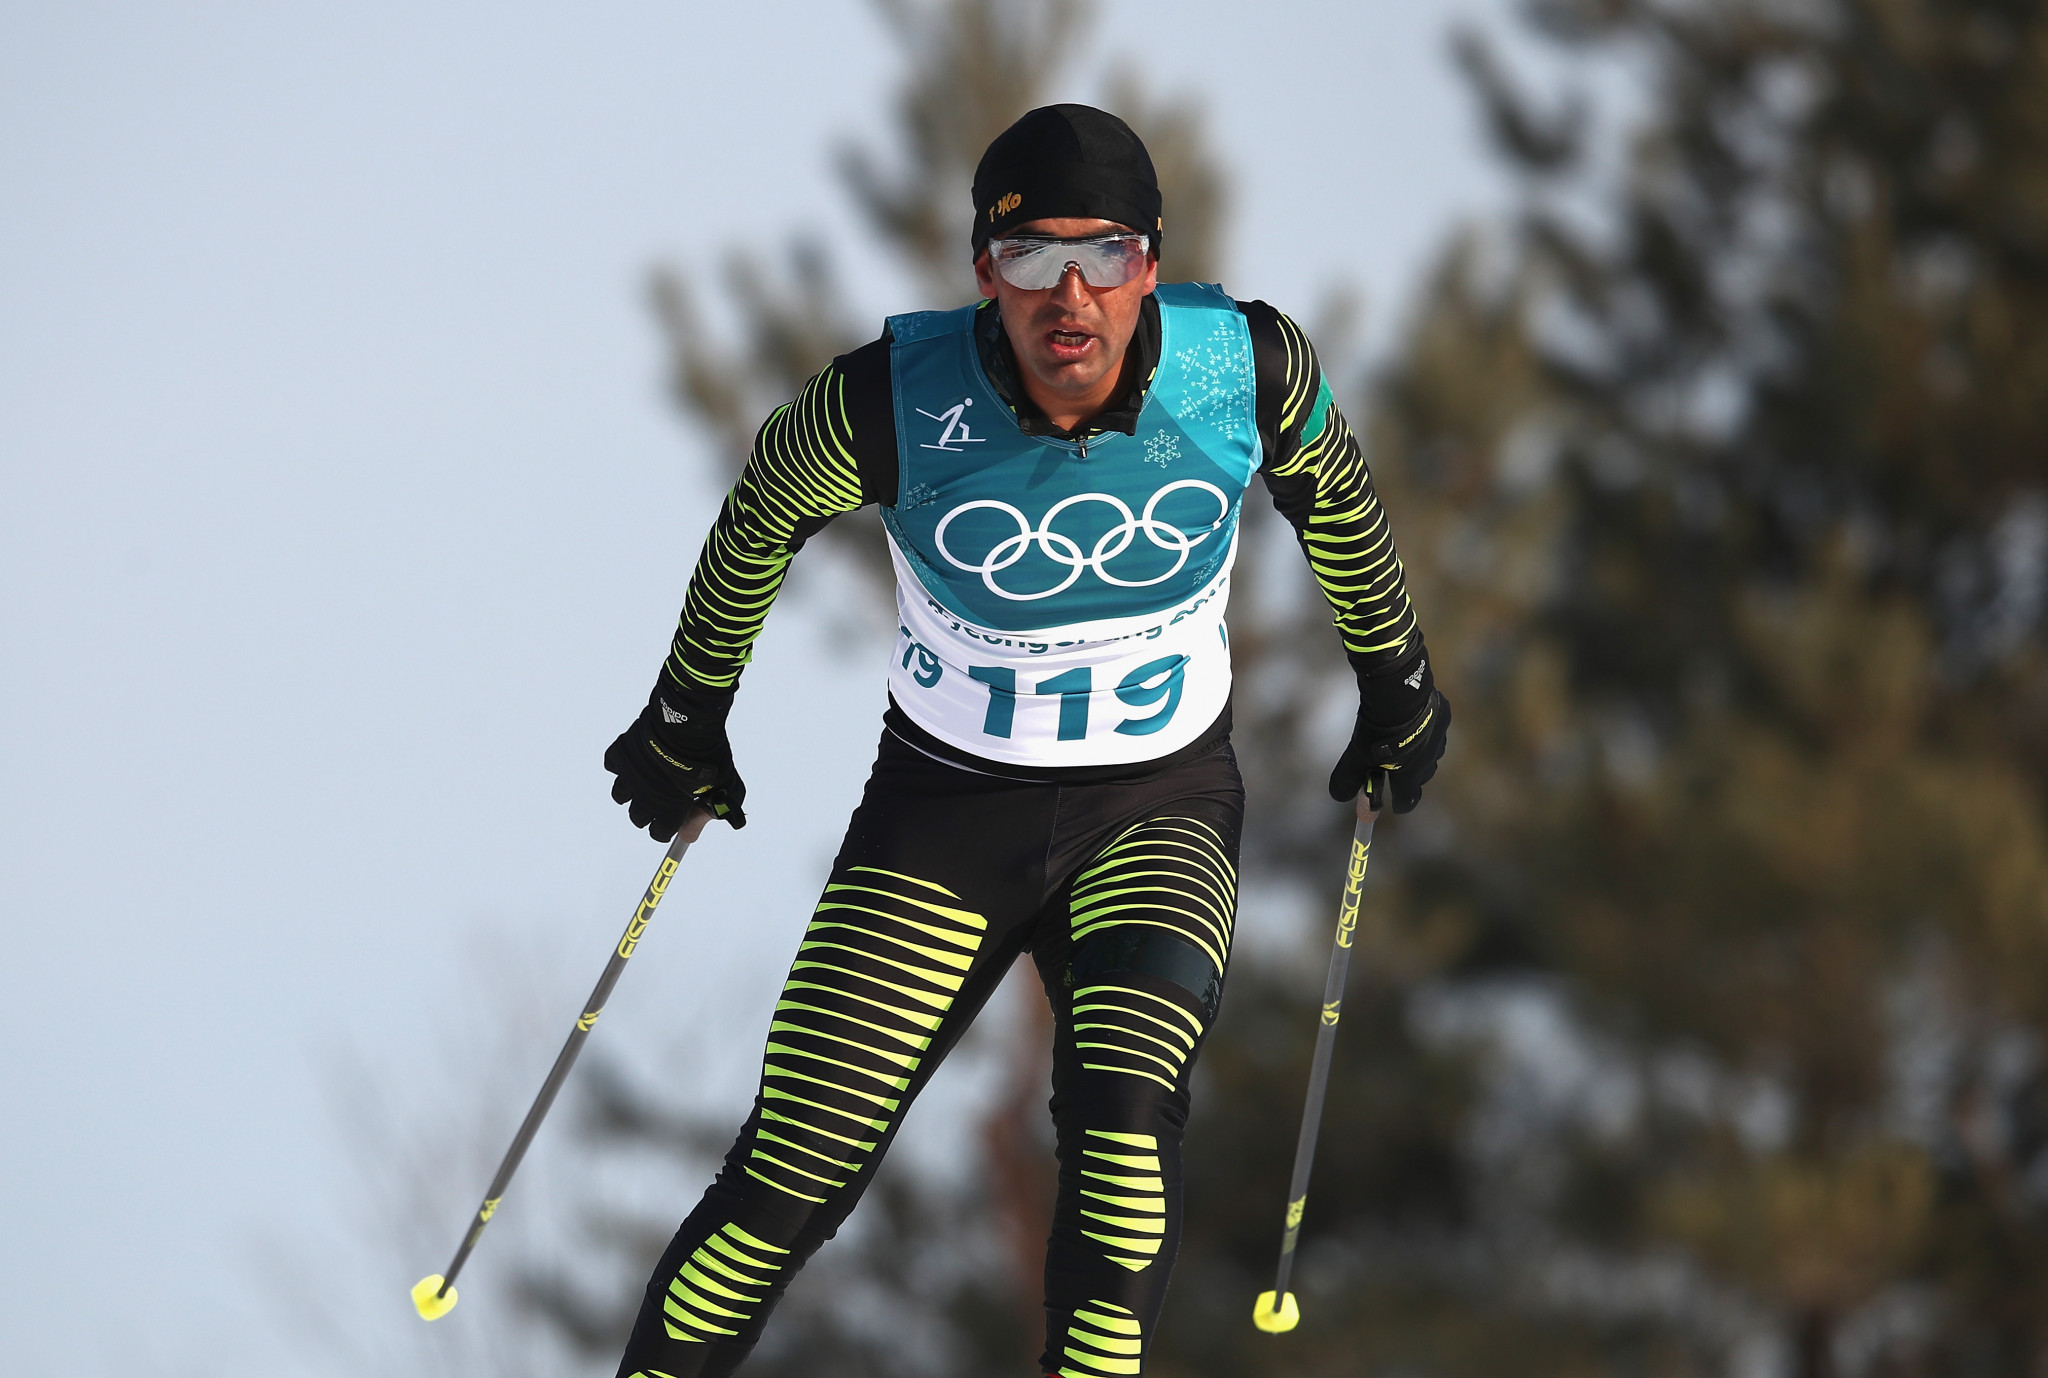 Pantelidis honoured for ski development work in Pakistan